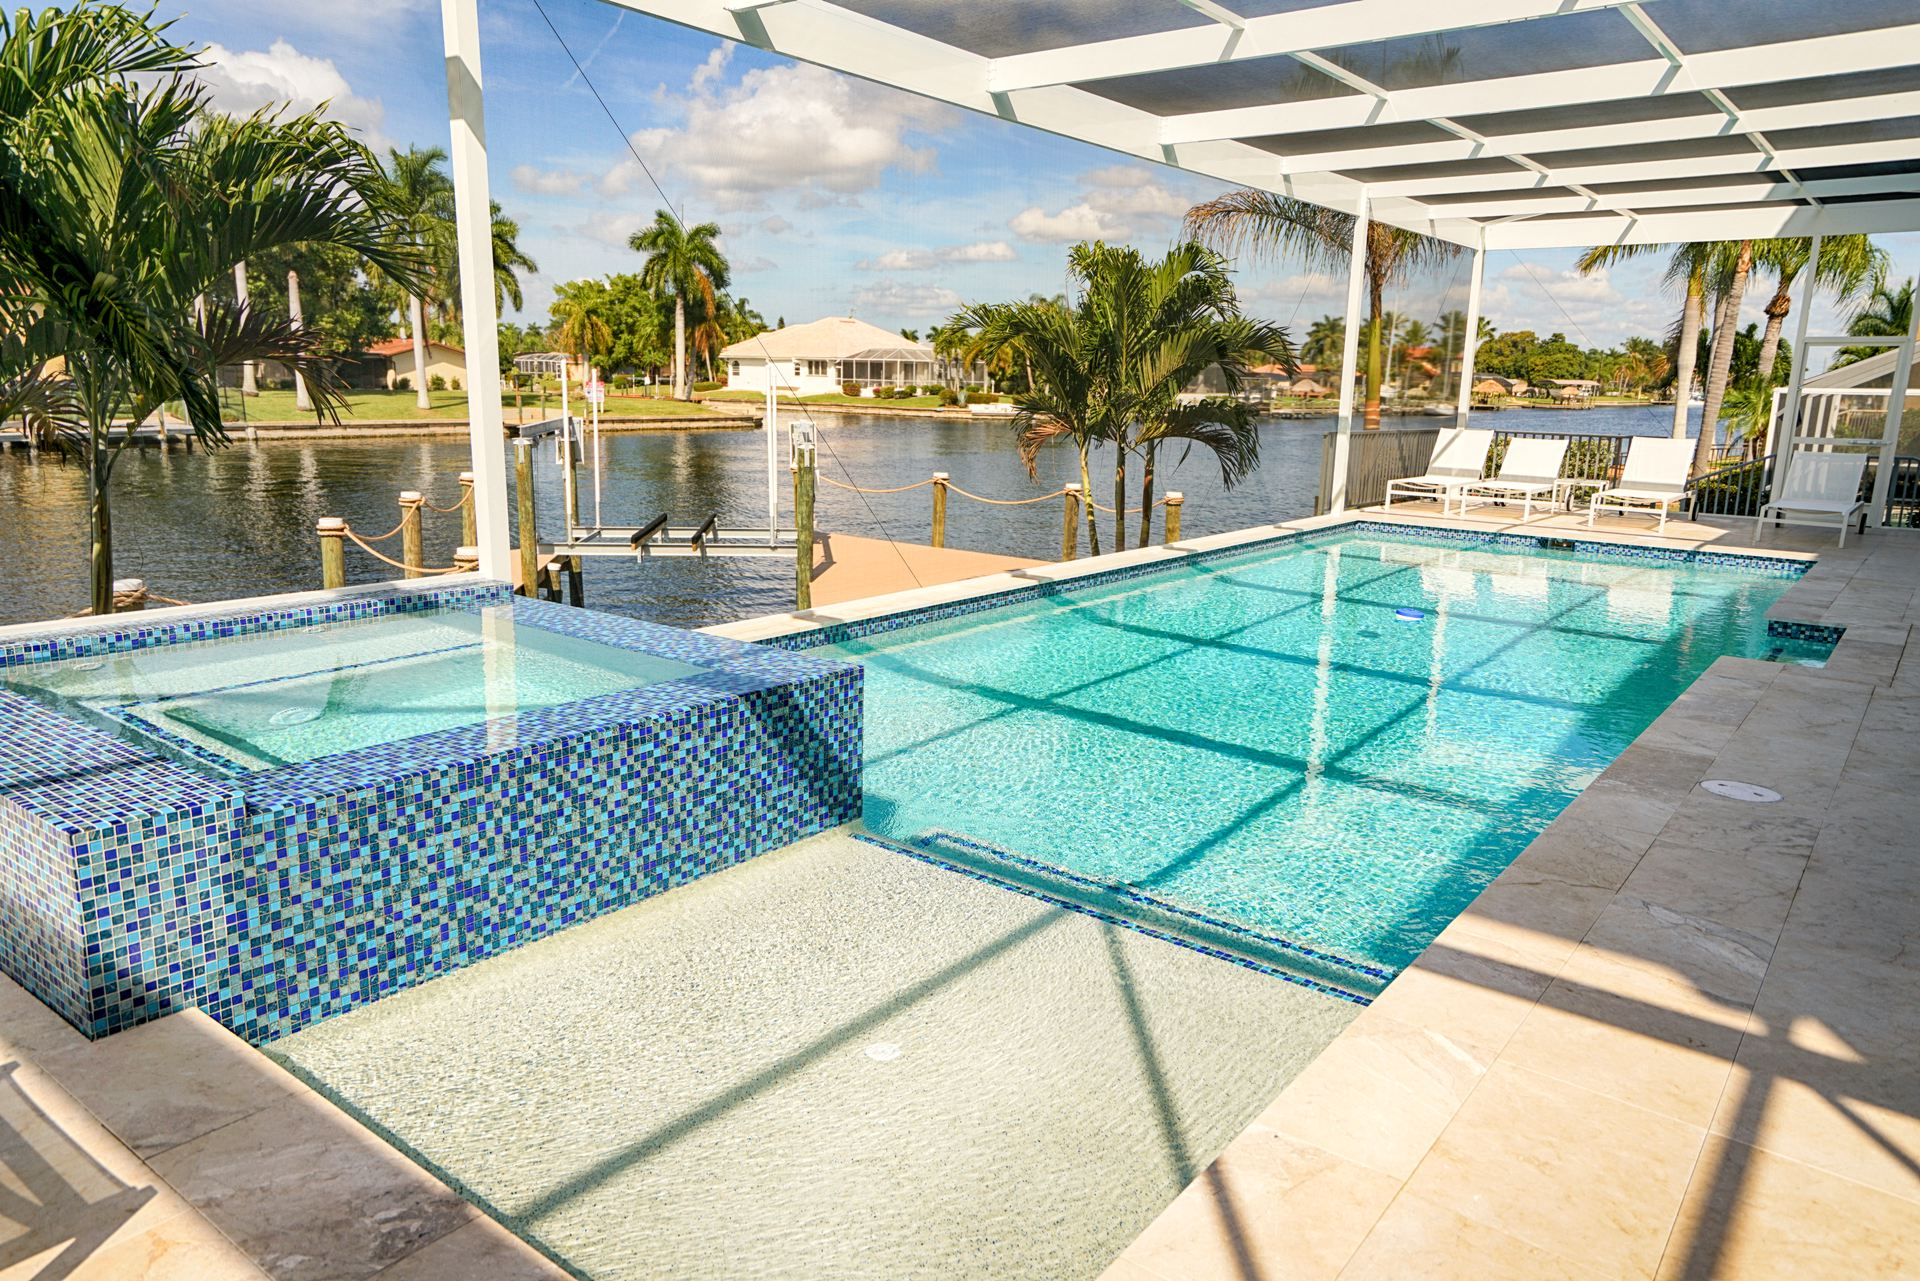 Pool Area in Florida